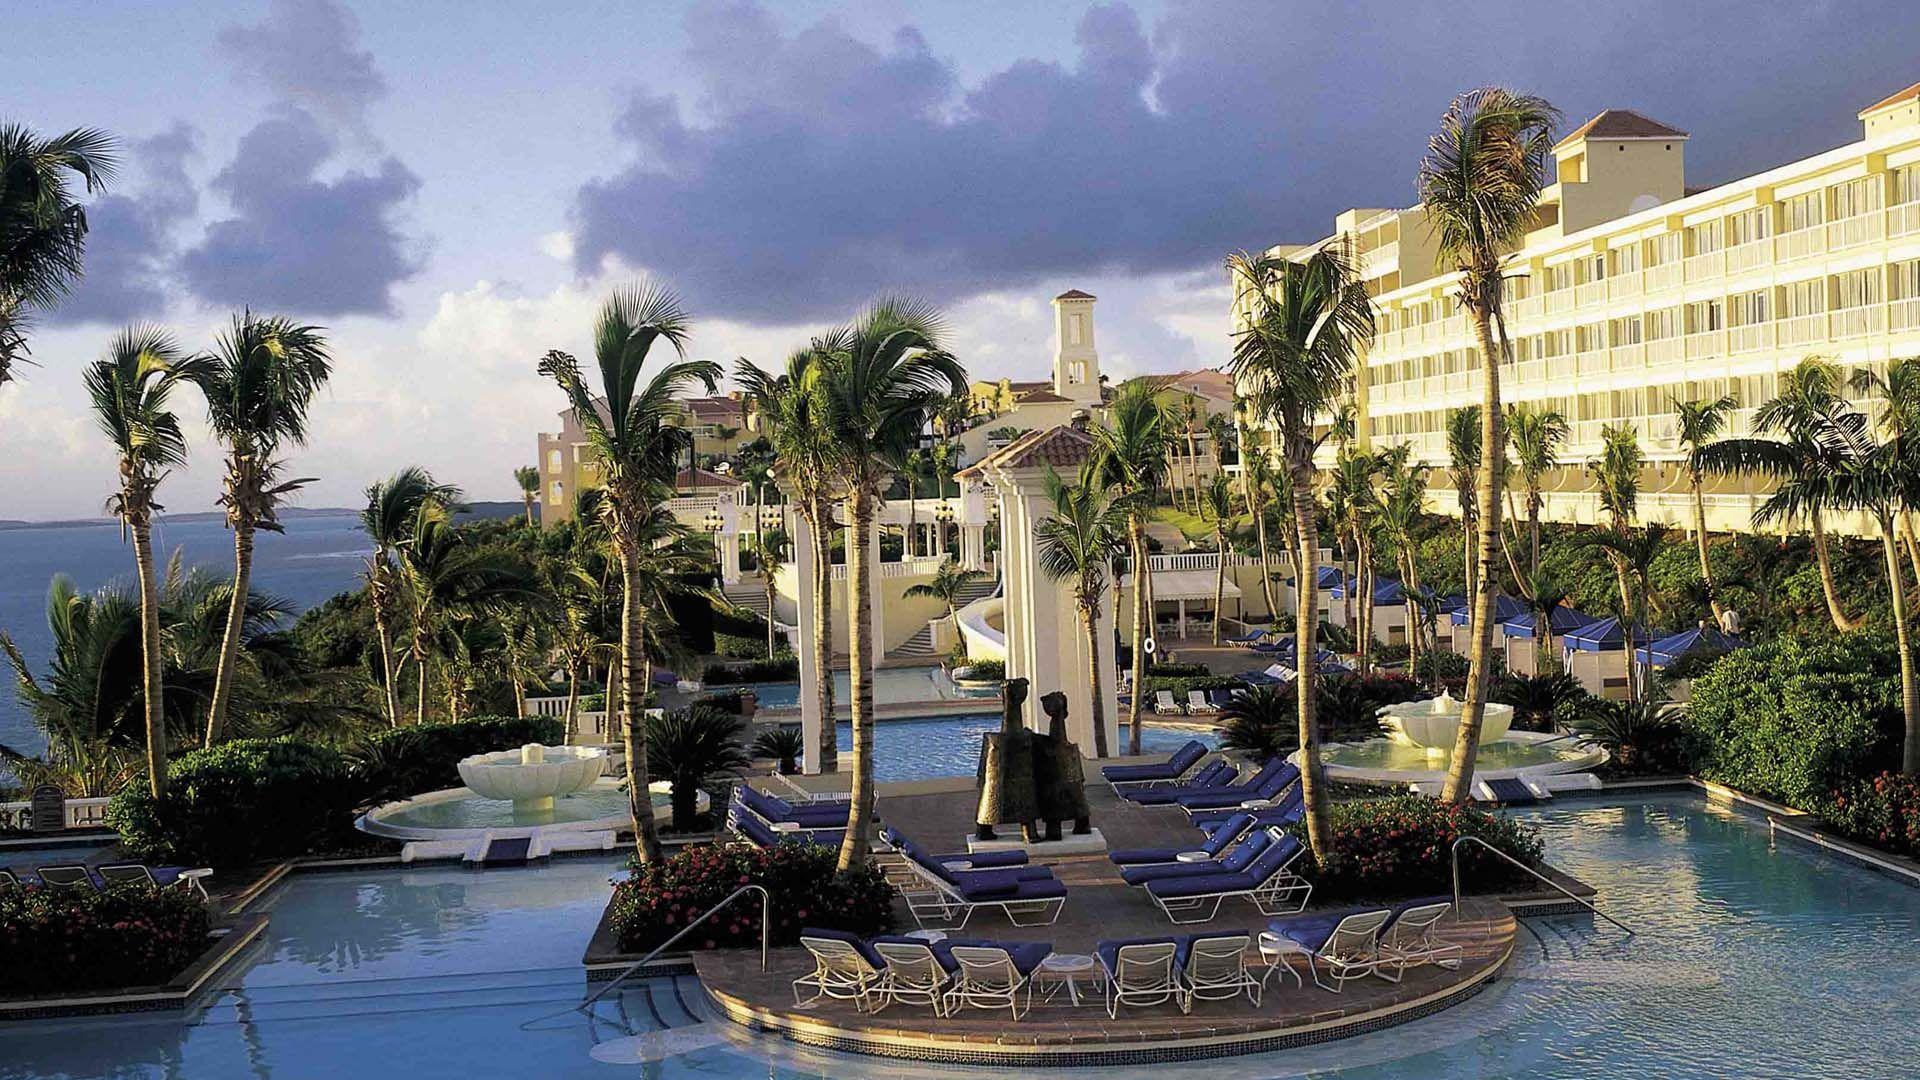 El Conquistador Resort and Casino, zona centro de la piscina